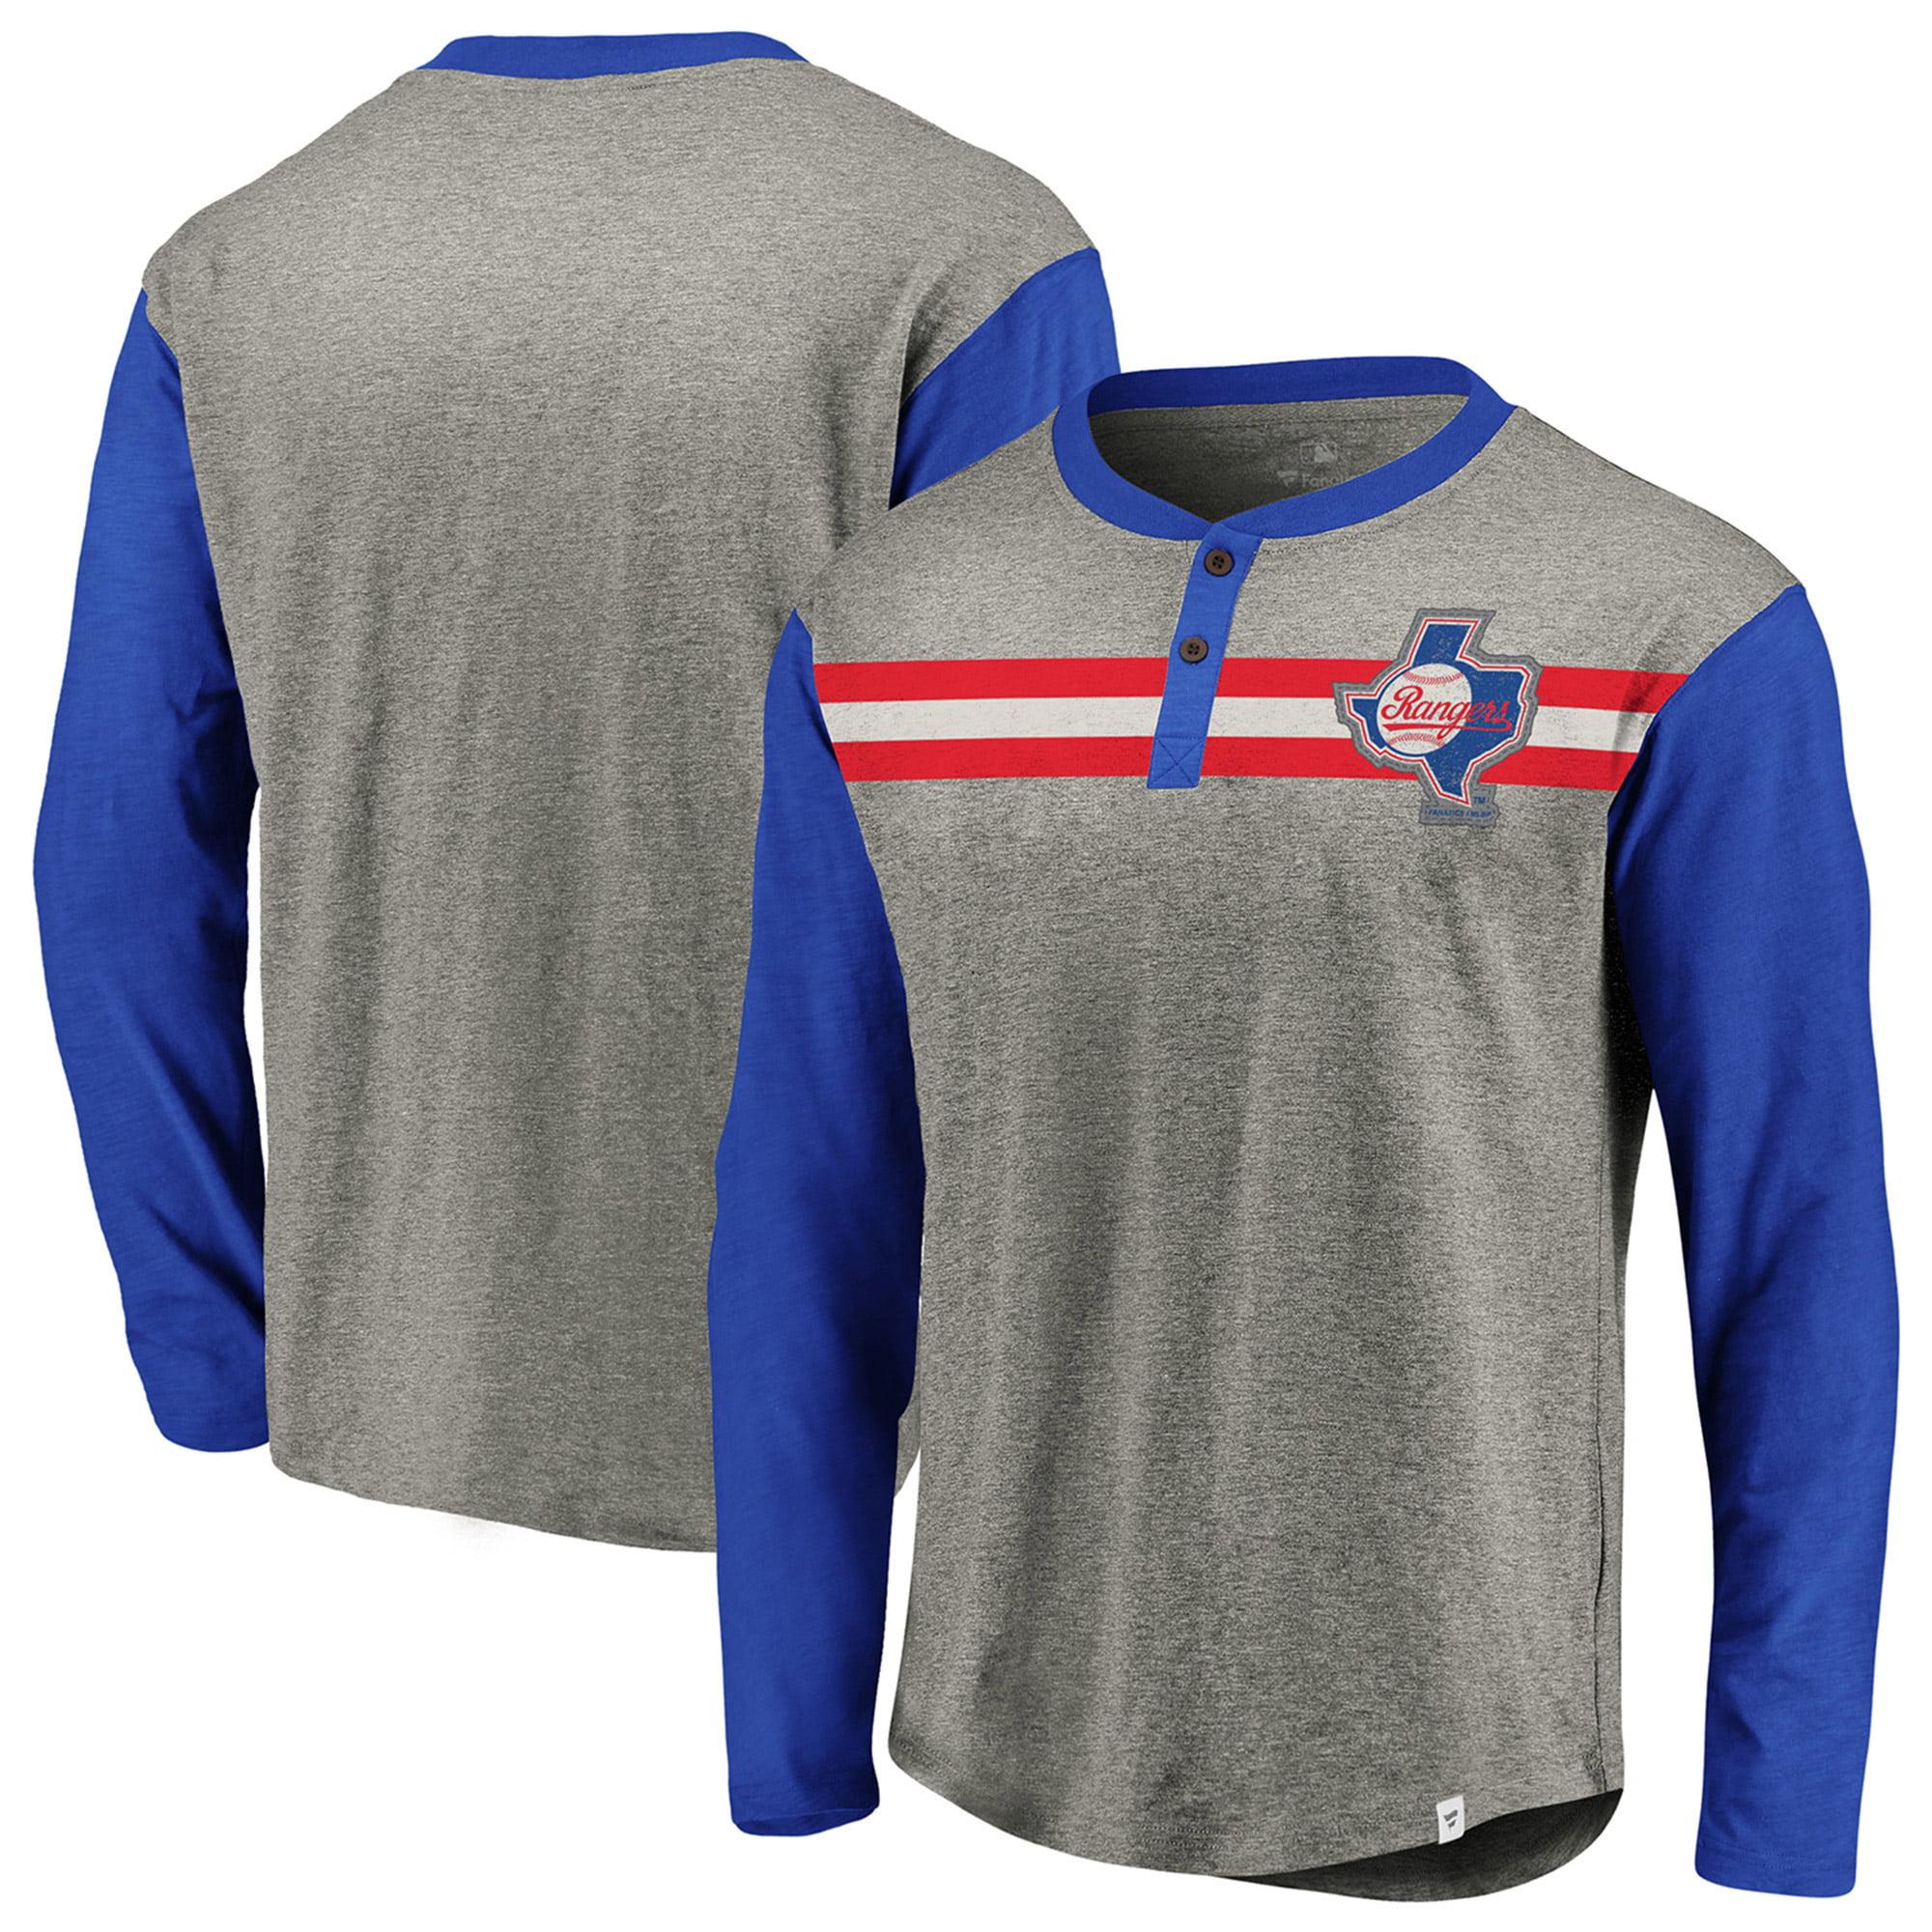 Texas Rangers Fanatics Branded True Classics Stripe Henley Long Sleeve T-Shirt - Heathered Gray/Royal